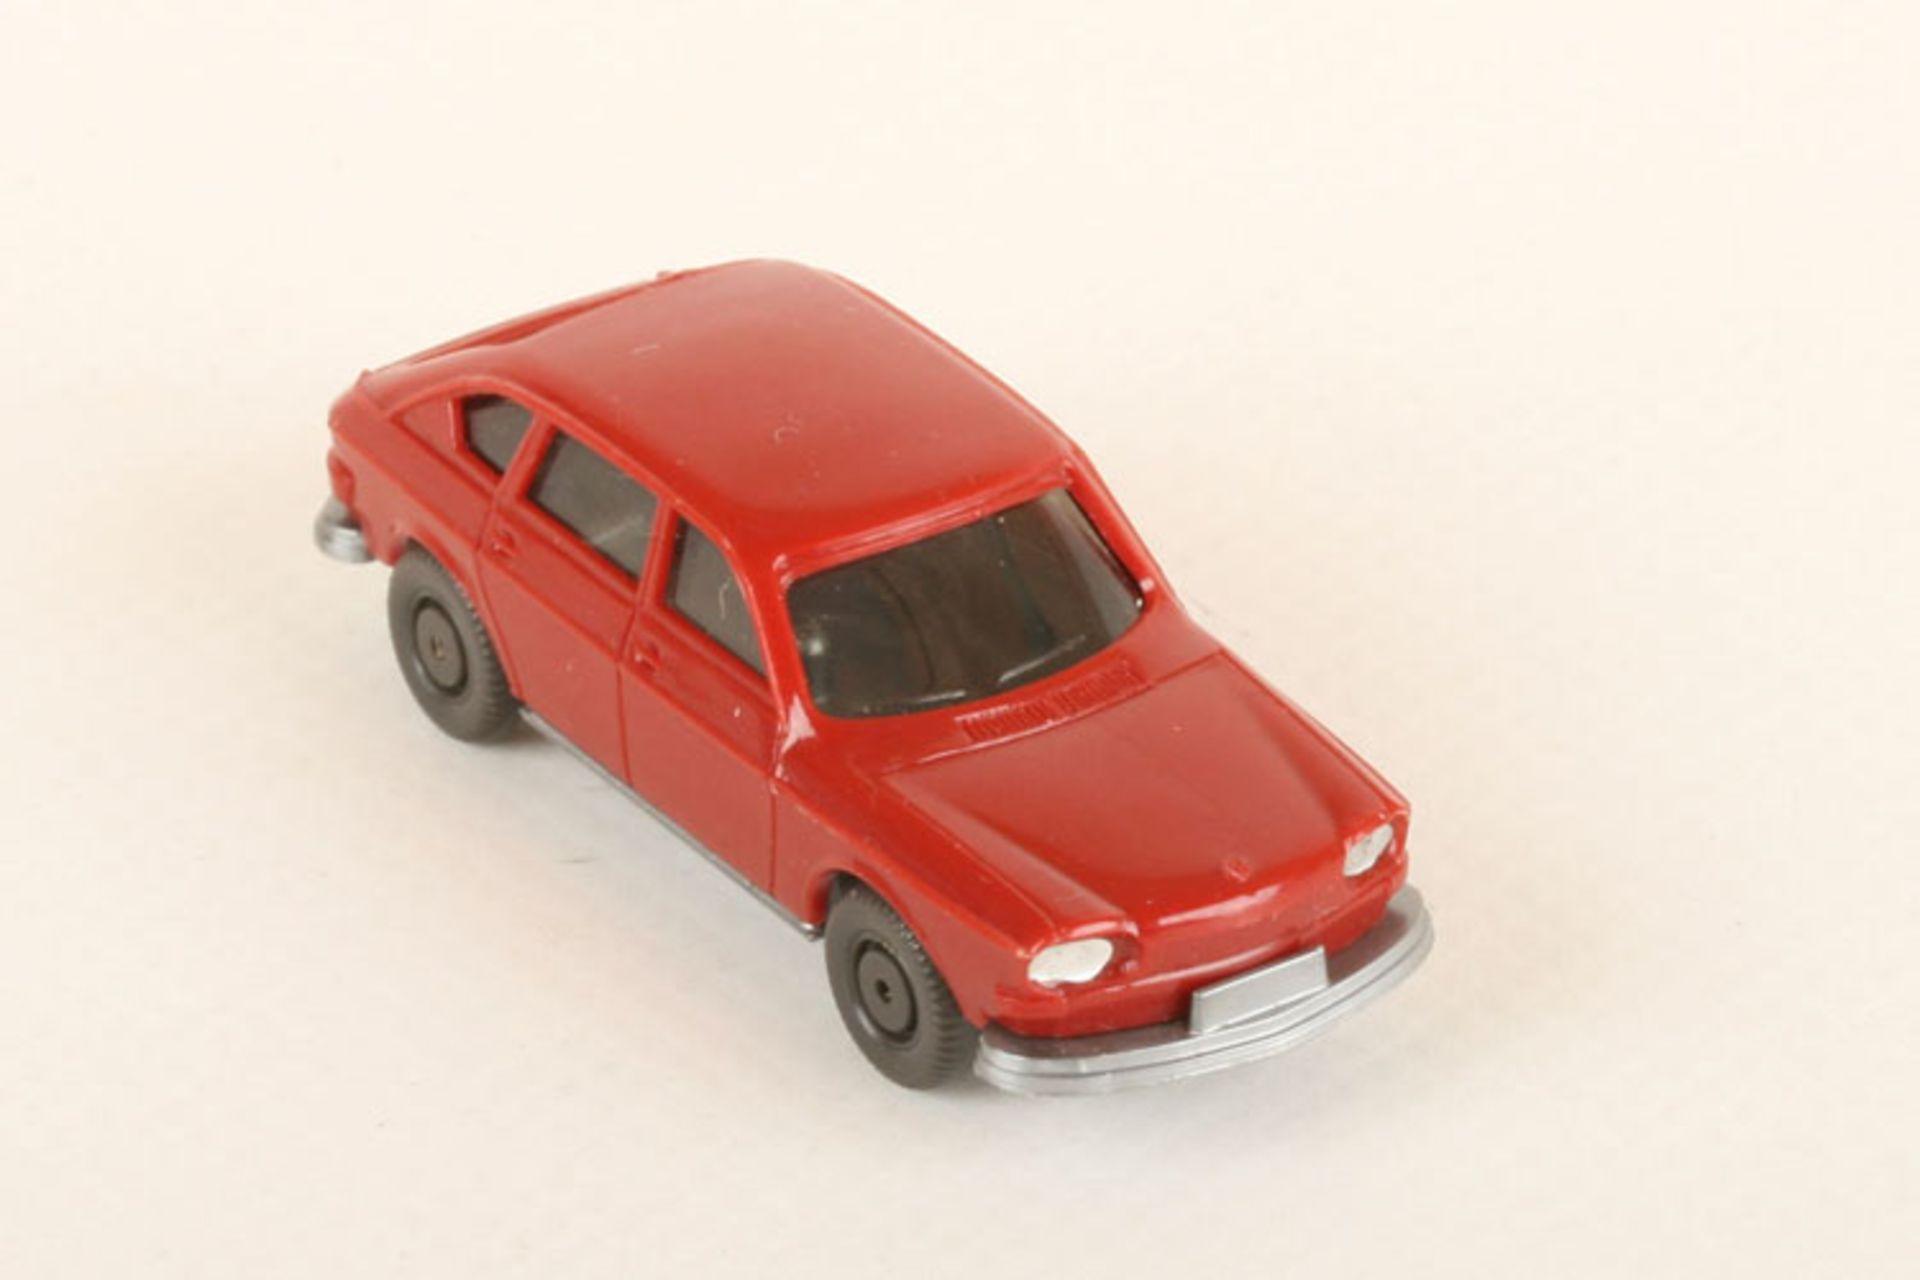 Los 1033 - Wiking VW 411 h'braunrot 46a/1a, Ladegut, neuwertig